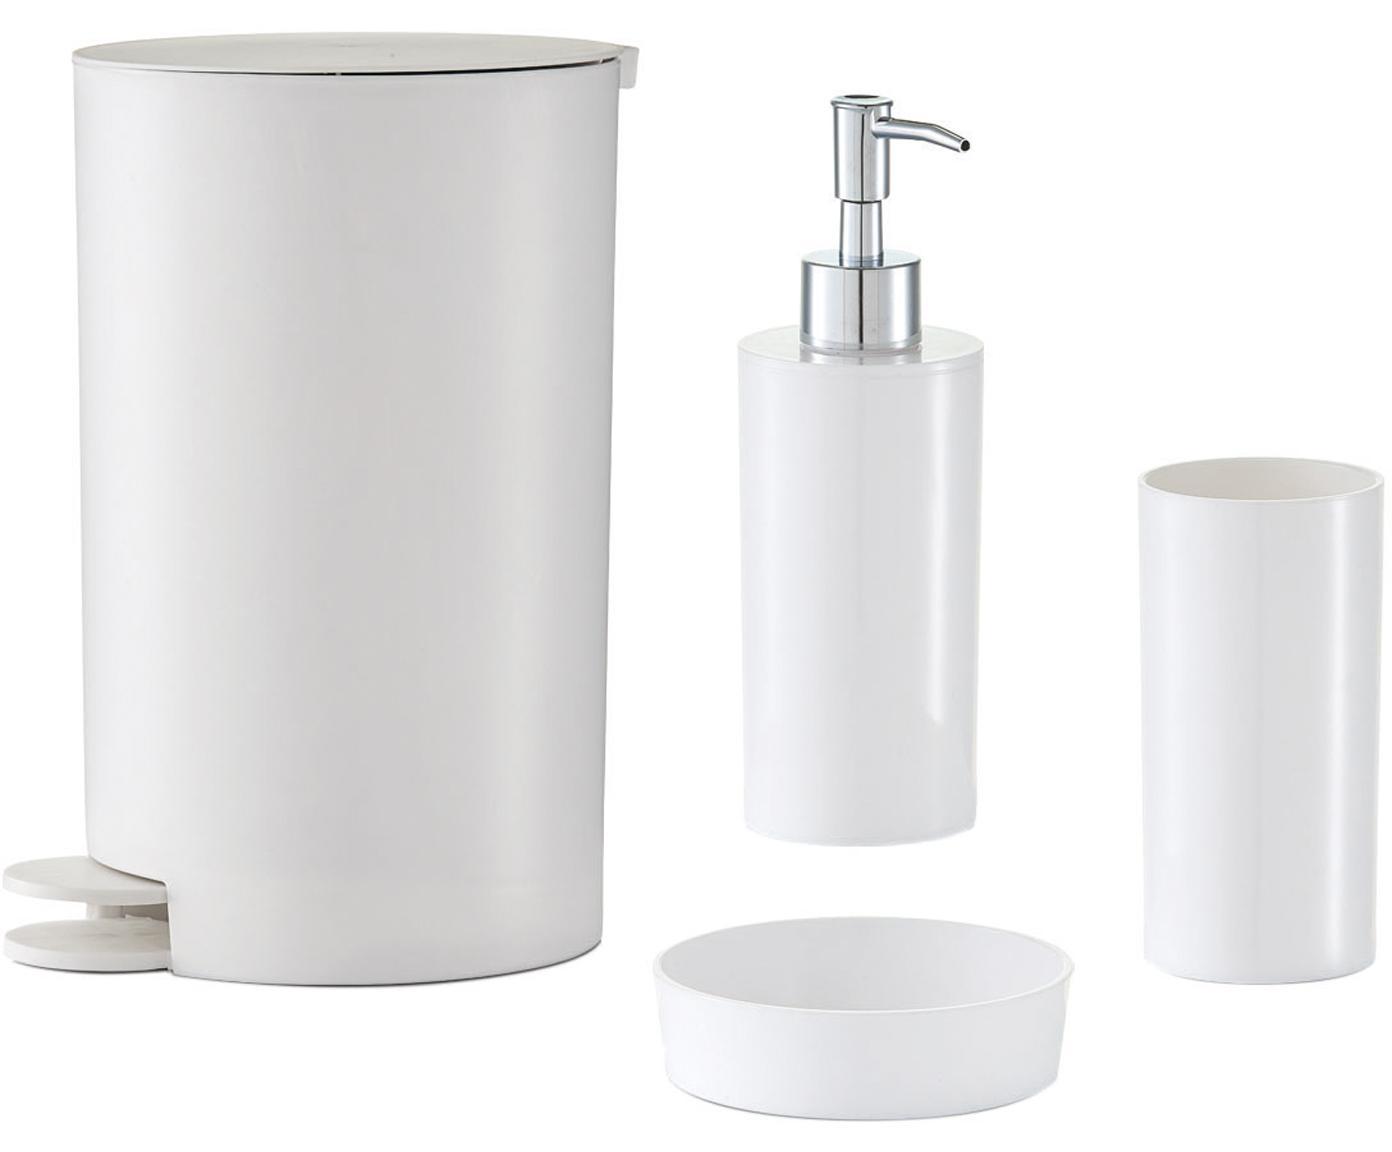 Bad-Accessoires-Set Nika, 4-tlg., Kunststoff, Weiß, Sondergrößen